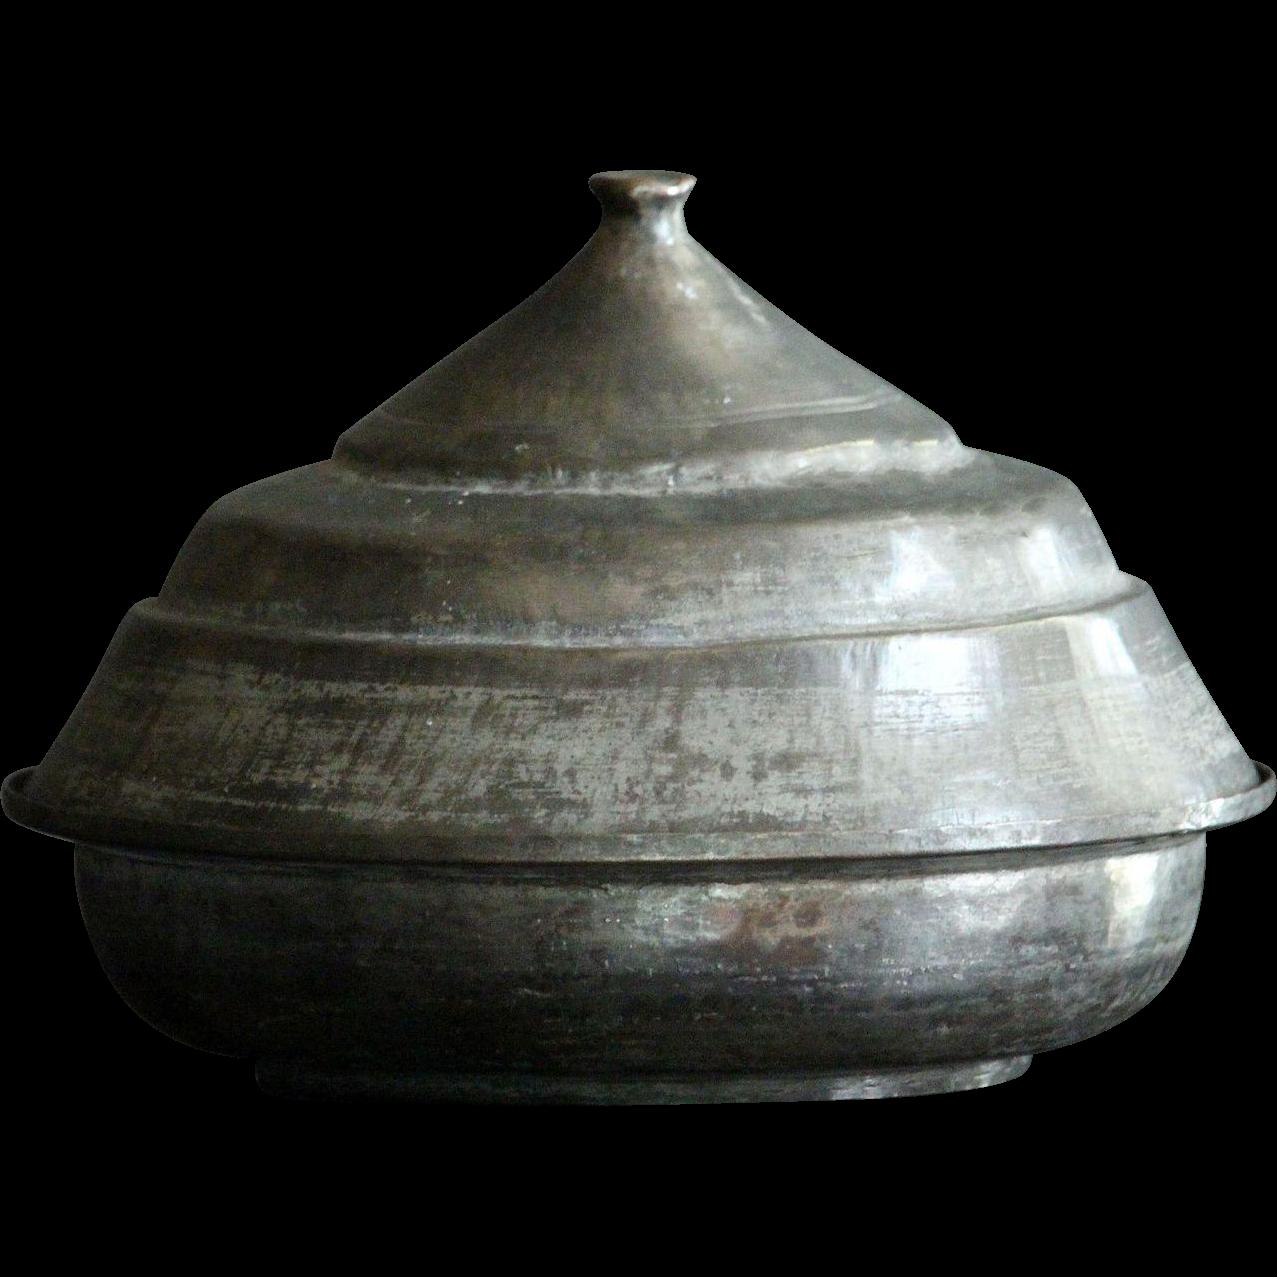 19th Century Turkish OTTOMAN Empire Tinned Copper Serving Dish & Lid